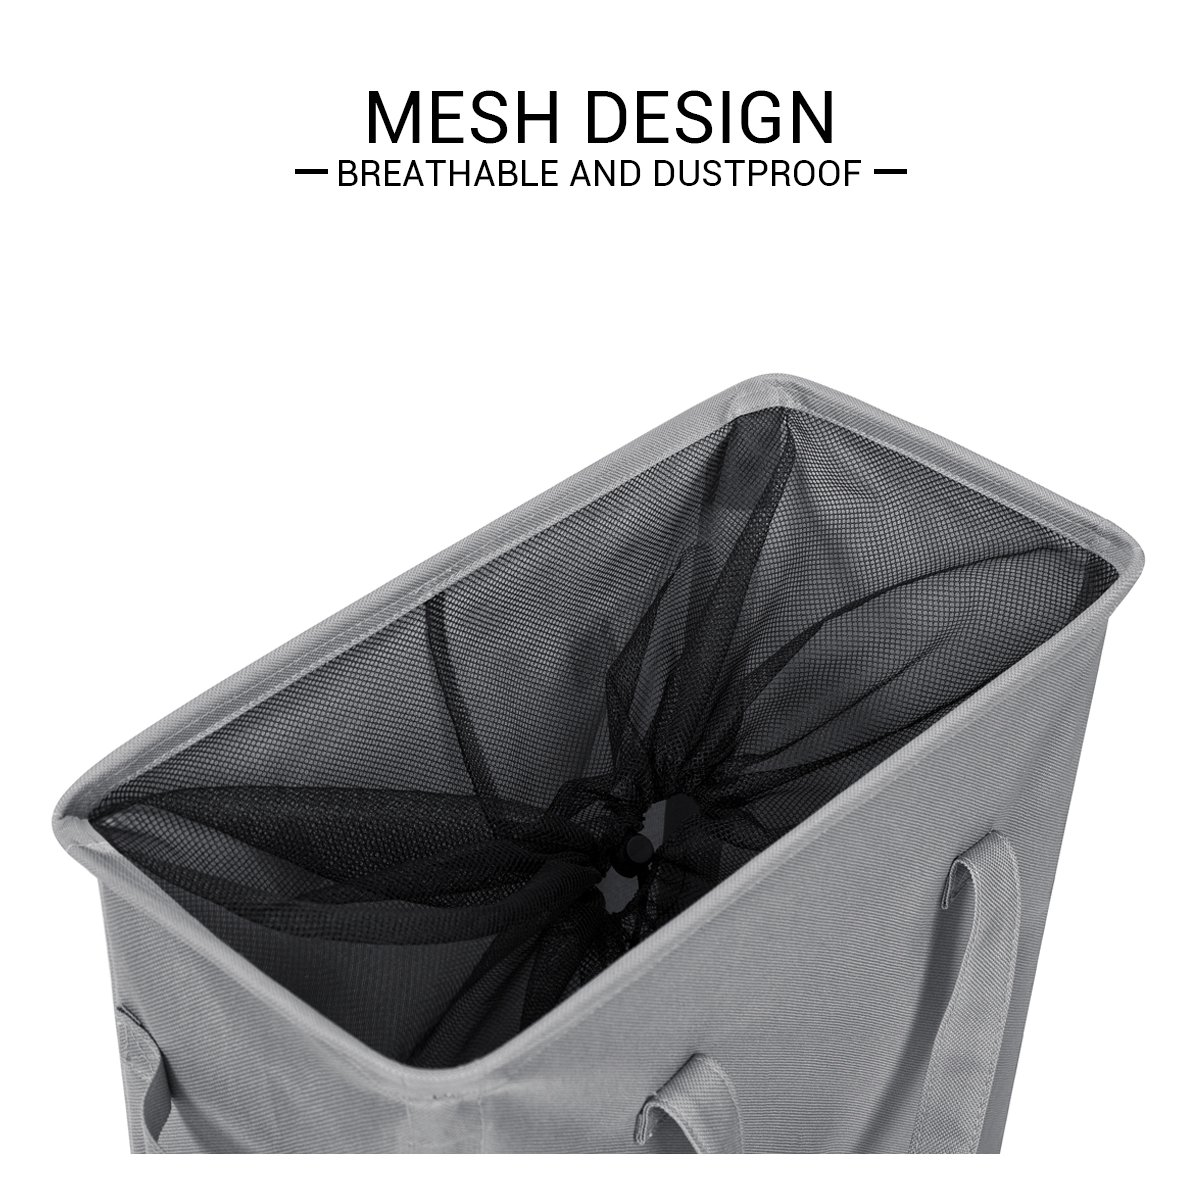 Chrislley slim laundry basket hamper handy foldable bag handle collapsible oxford cloth basket bin organizer 44 5l(grey) amazon co uk kitchen home